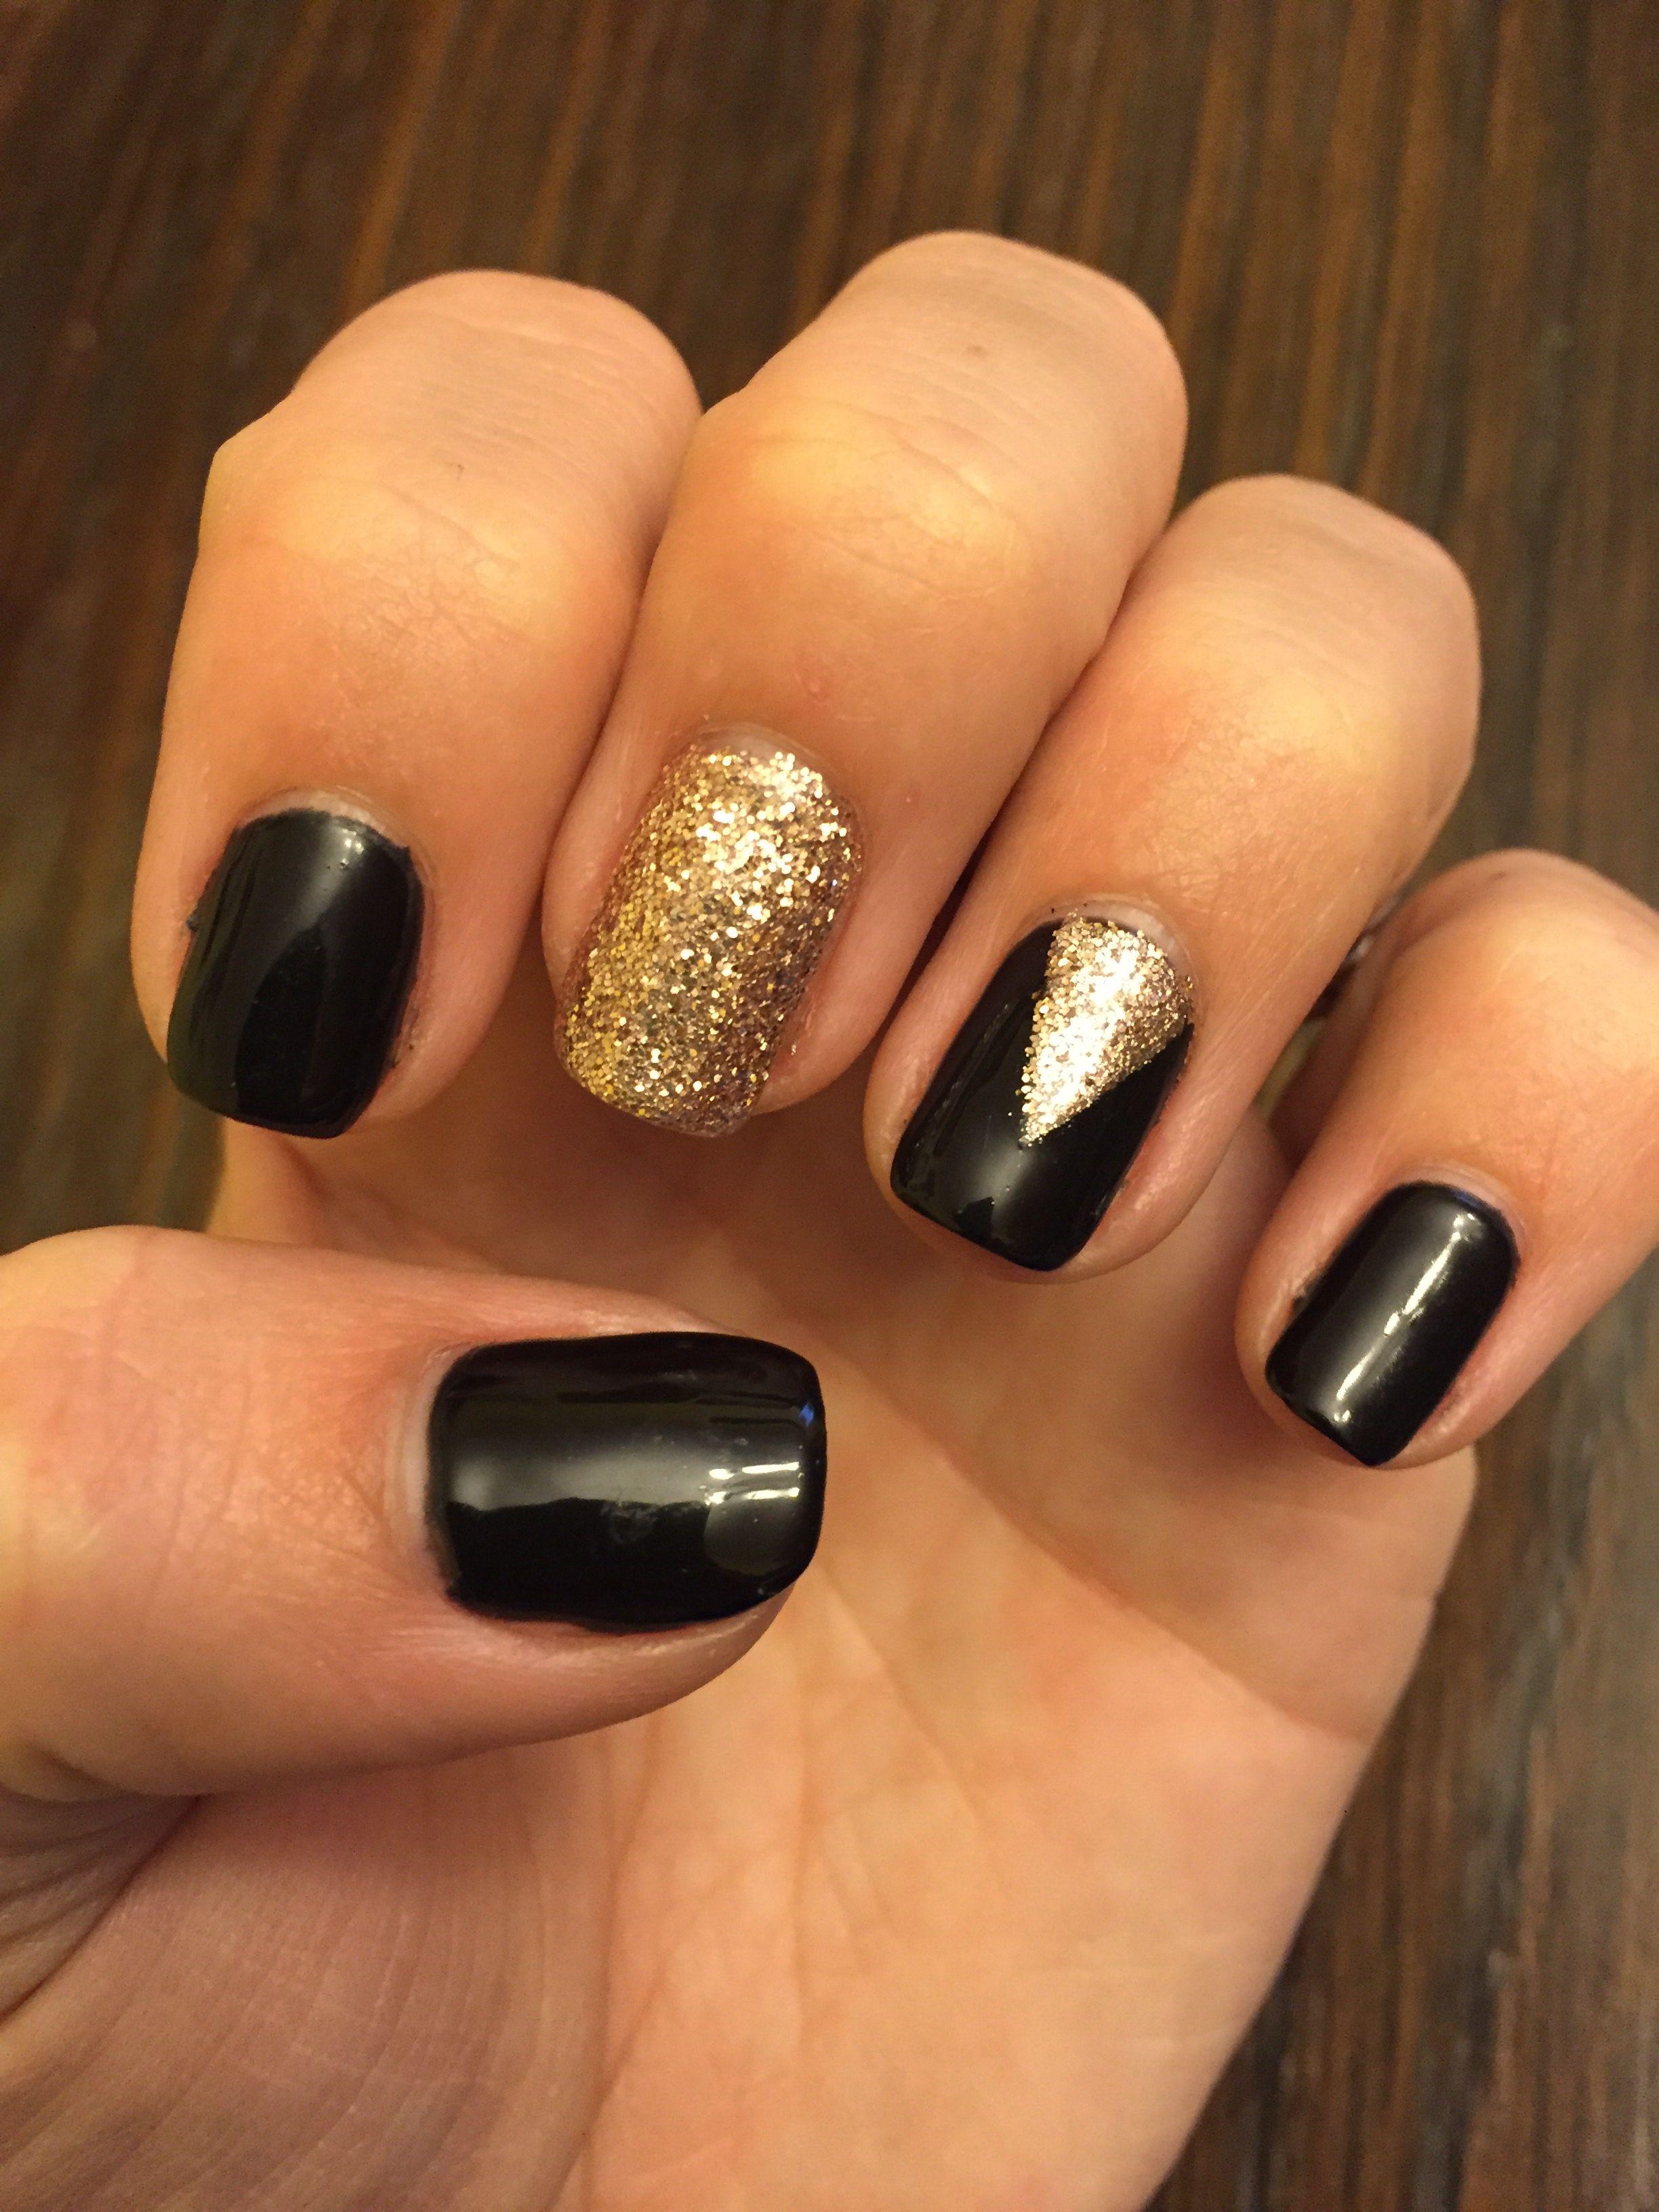 Black And Gold Cnd Shellac Glitter Nail Design Nails My Guilty